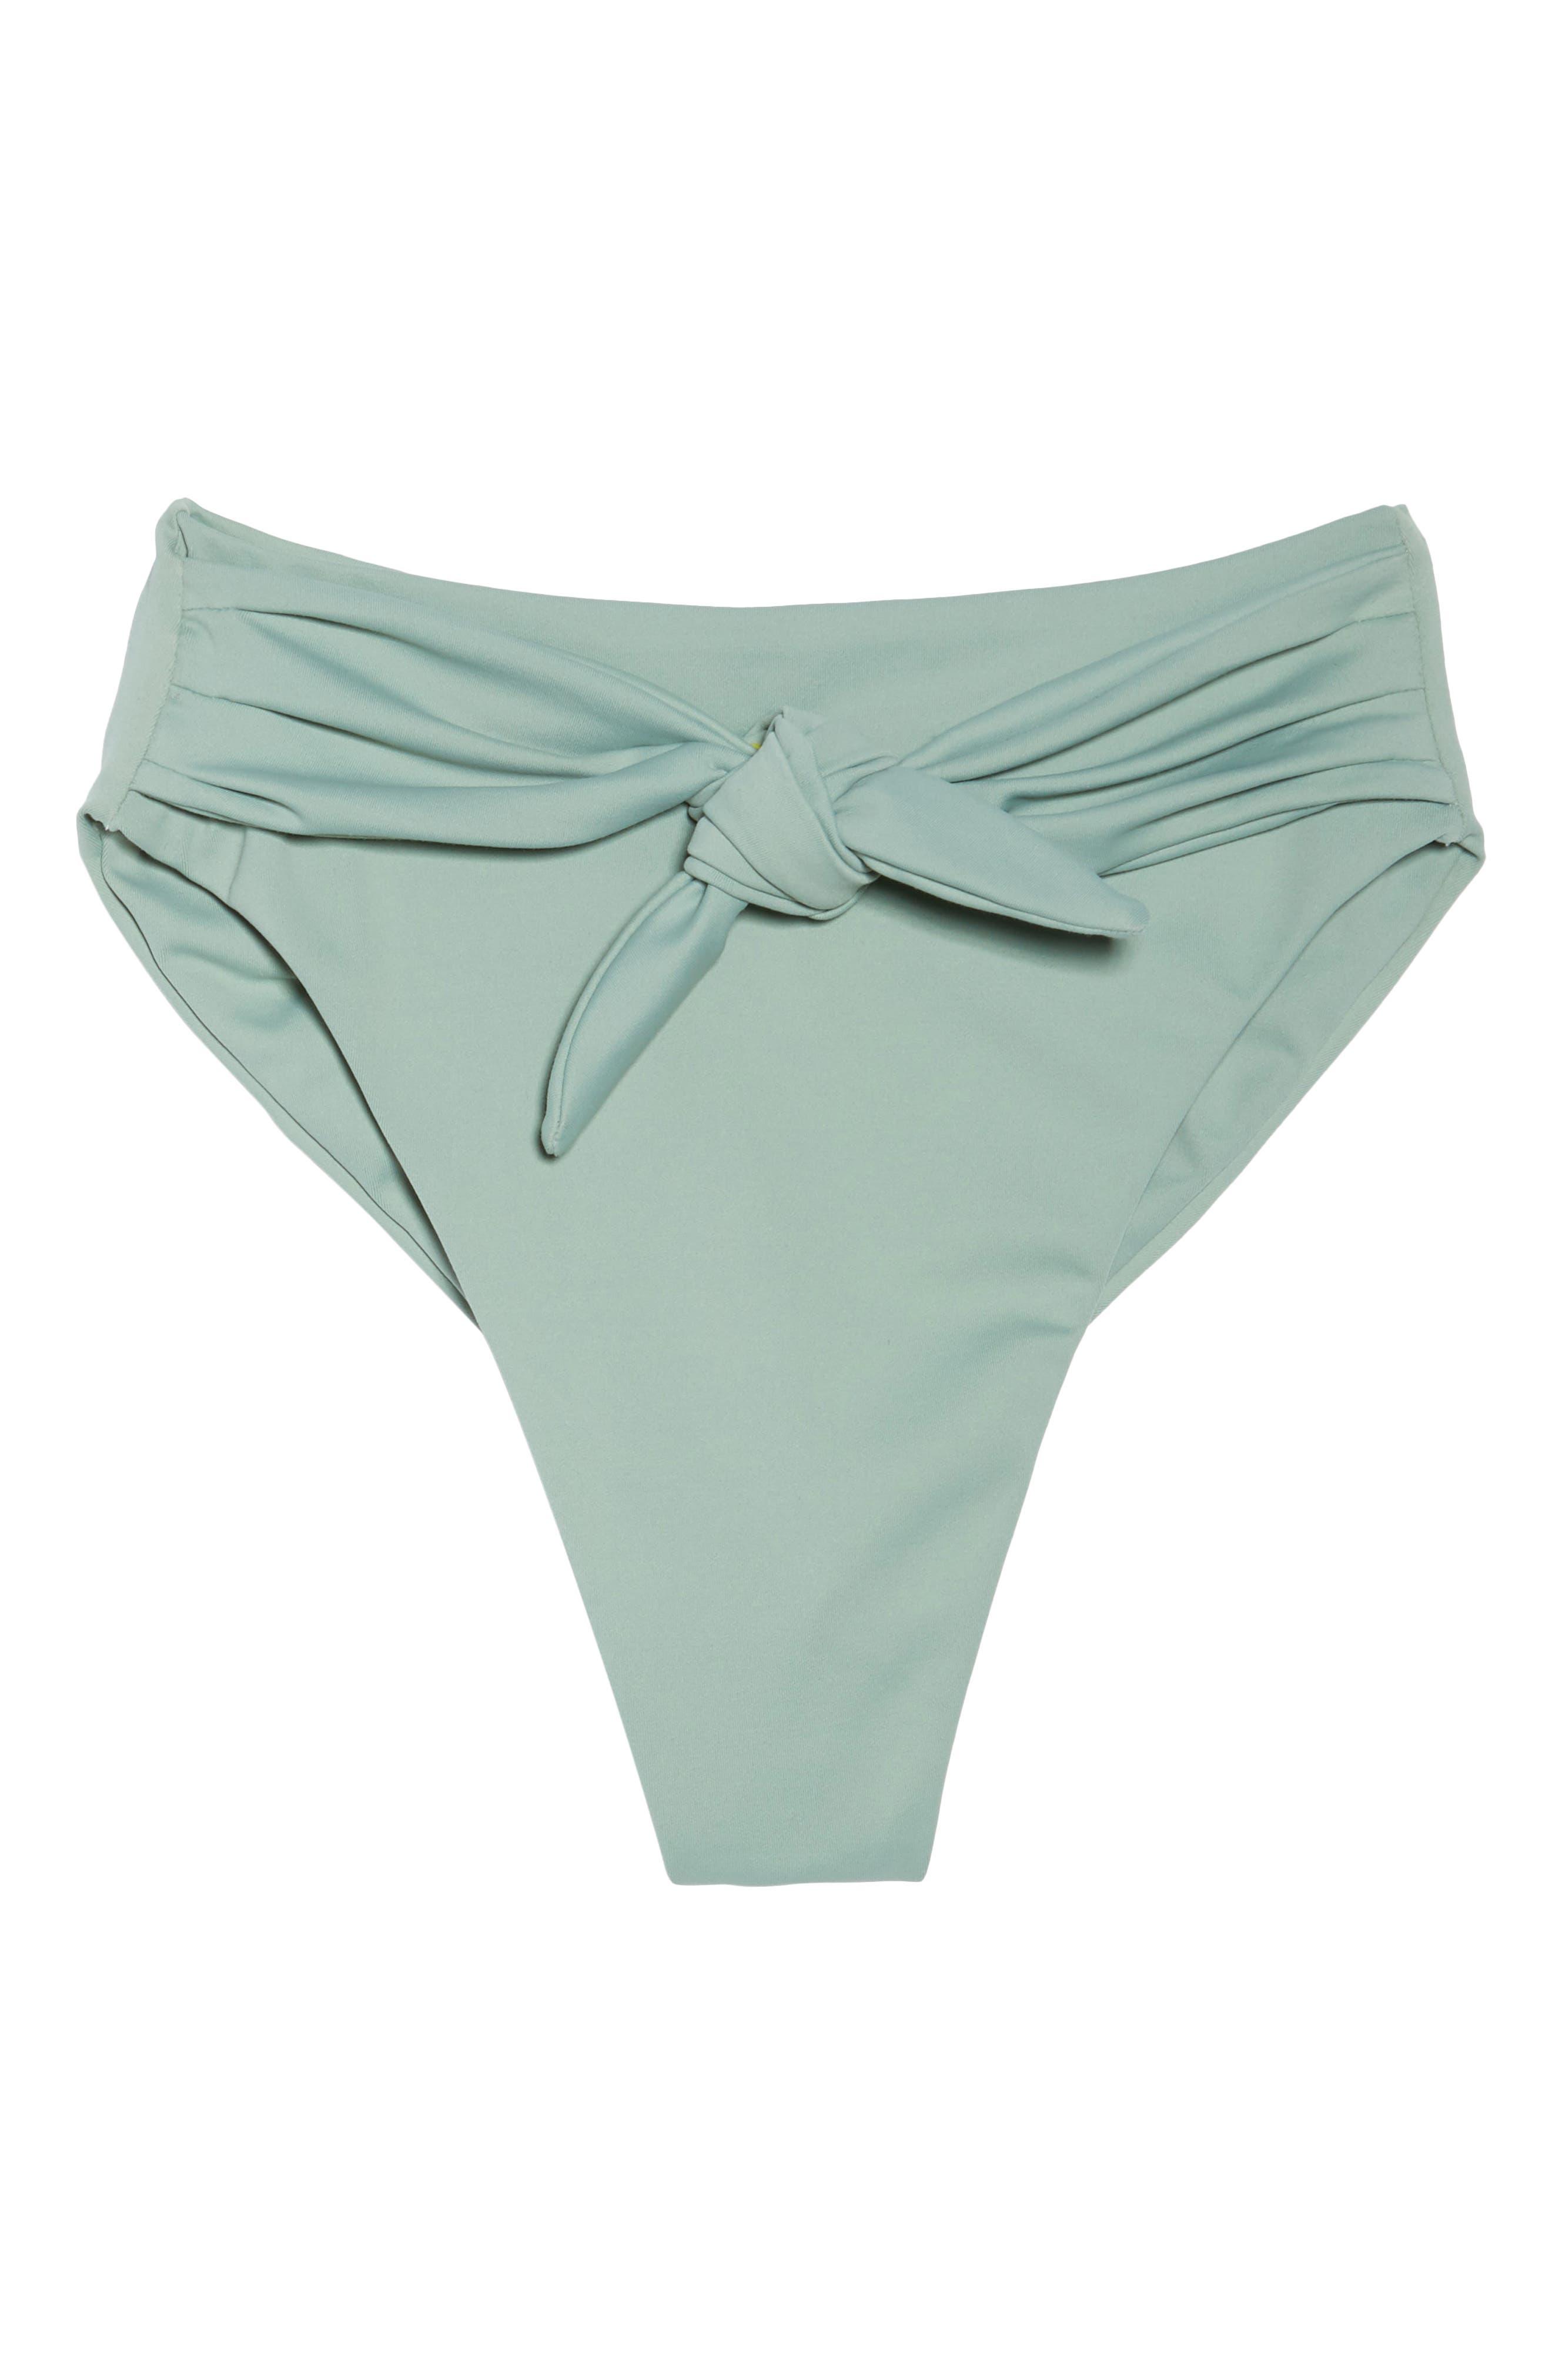 Paula Tie-Up Bikini Bottoms,                             Alternate thumbnail 9, color,                             Pistache Green